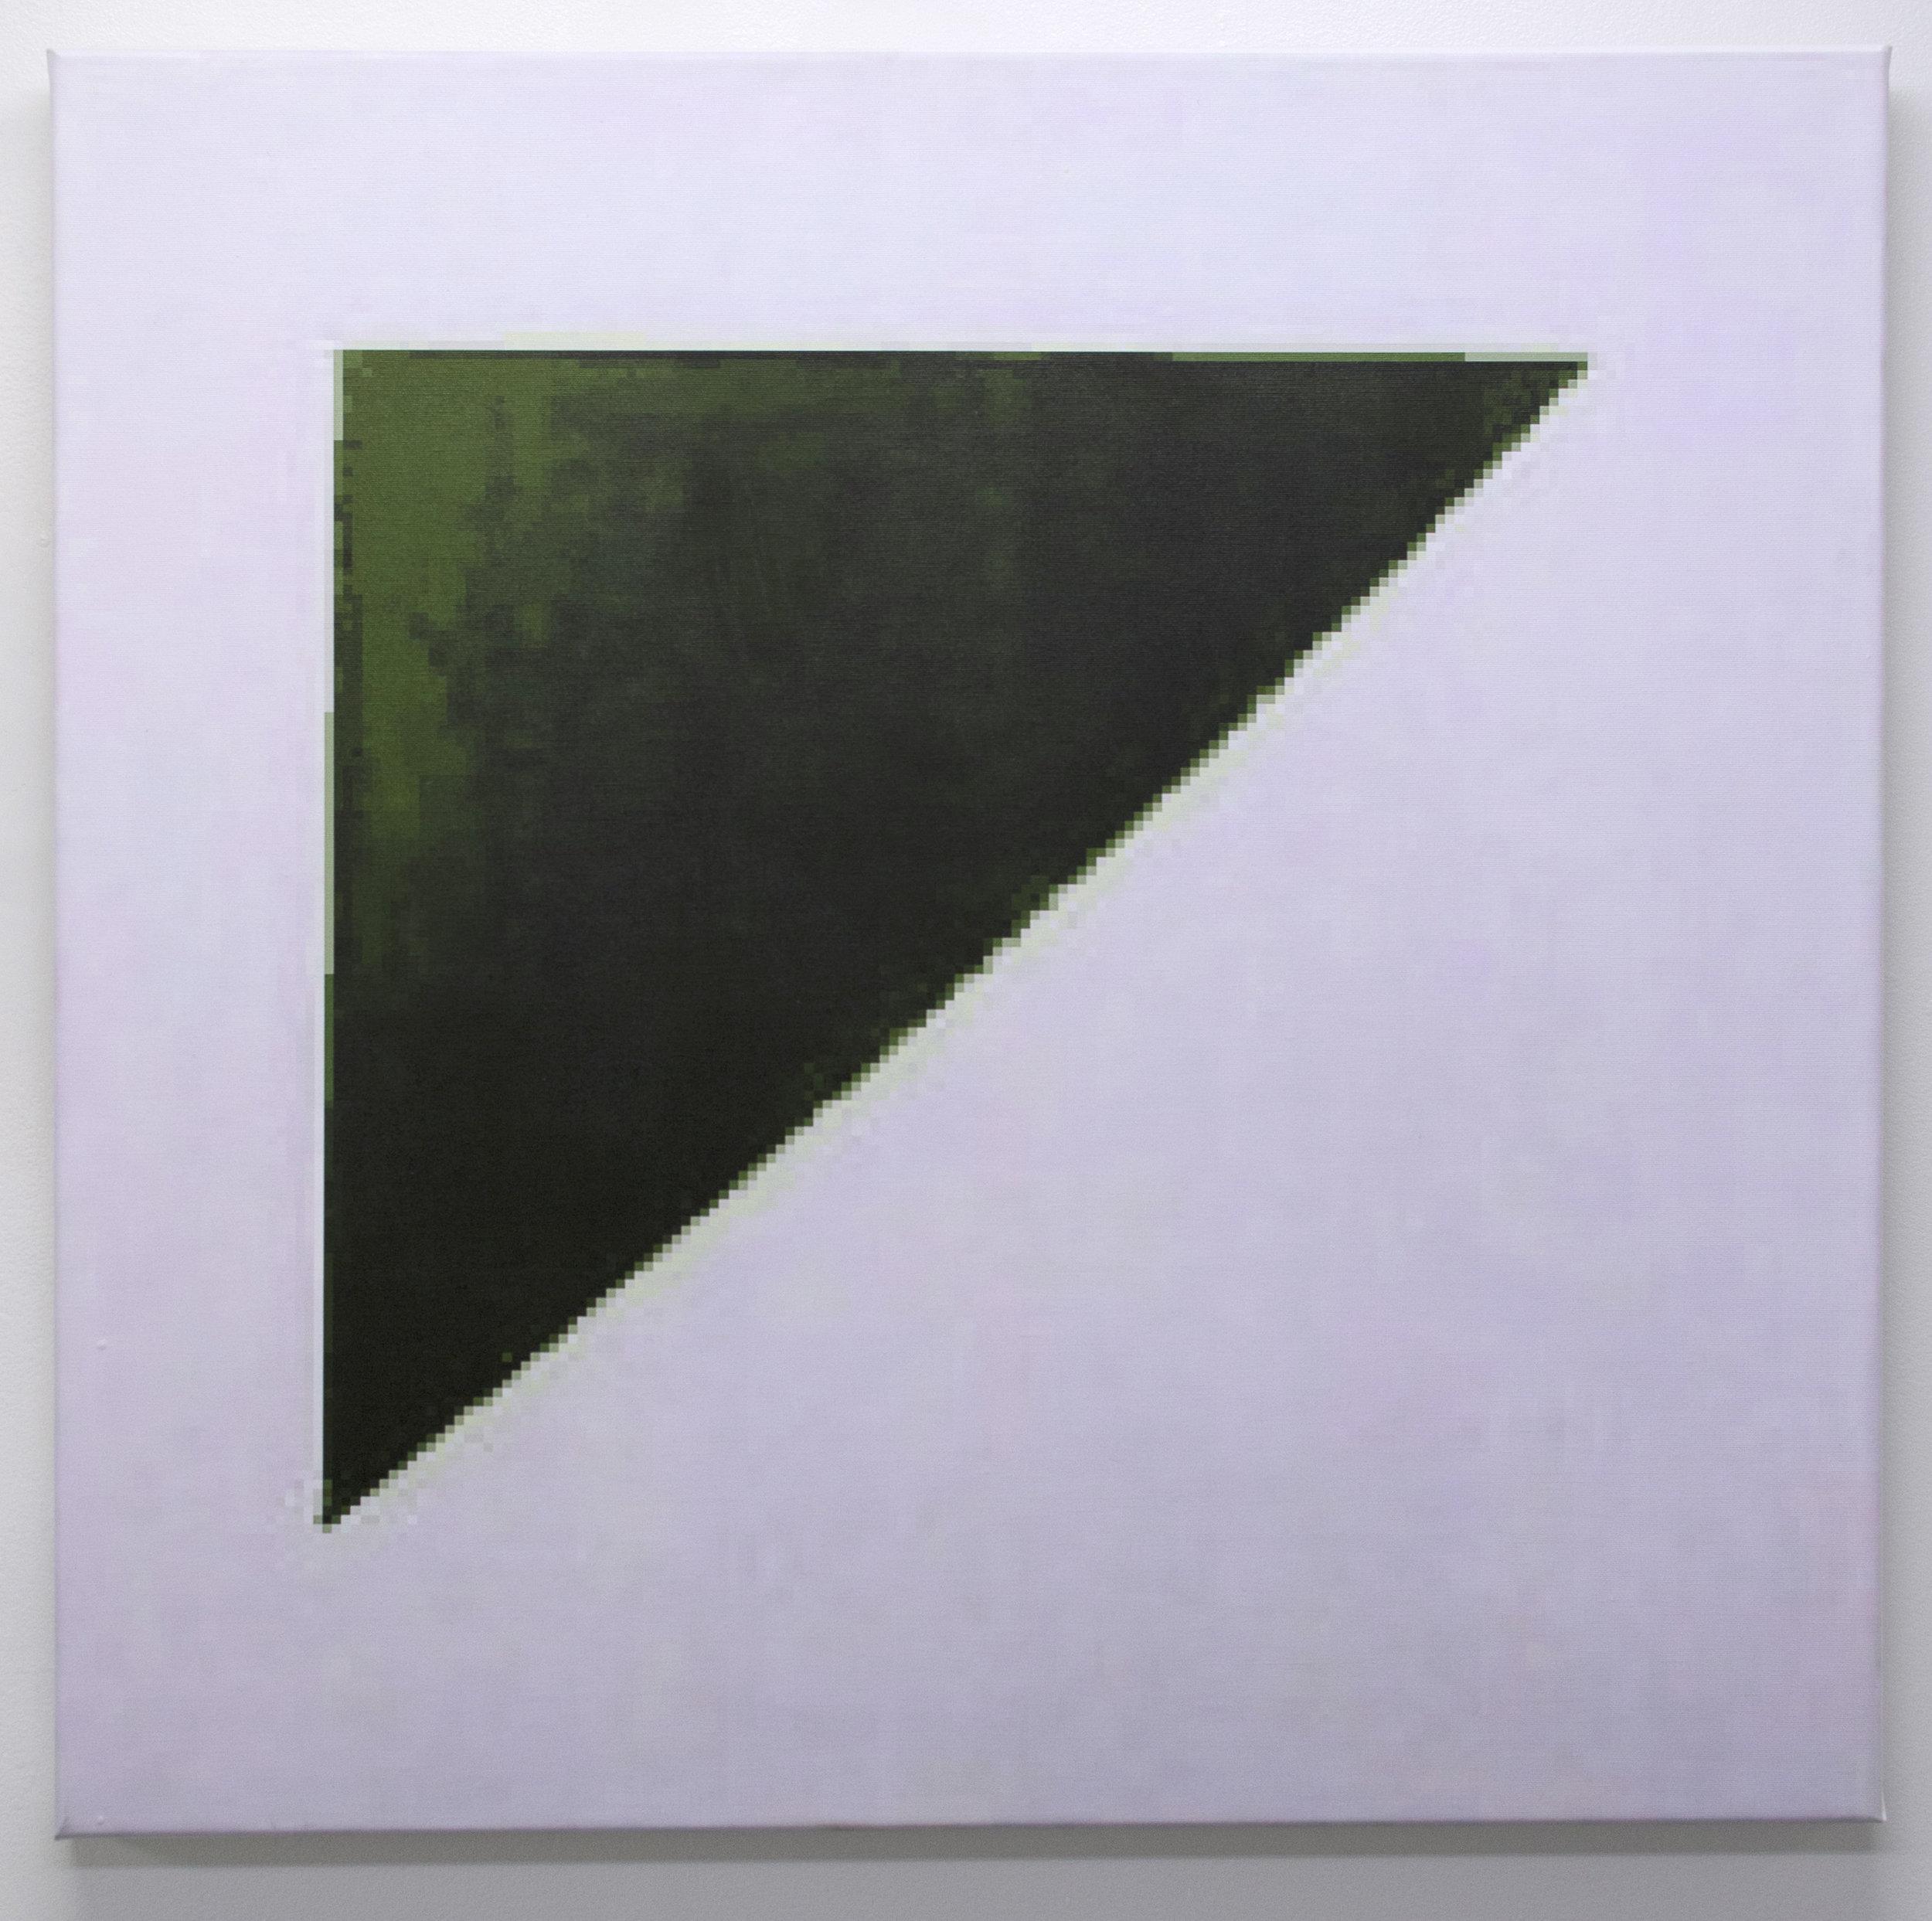 GreenCurve Radius 20